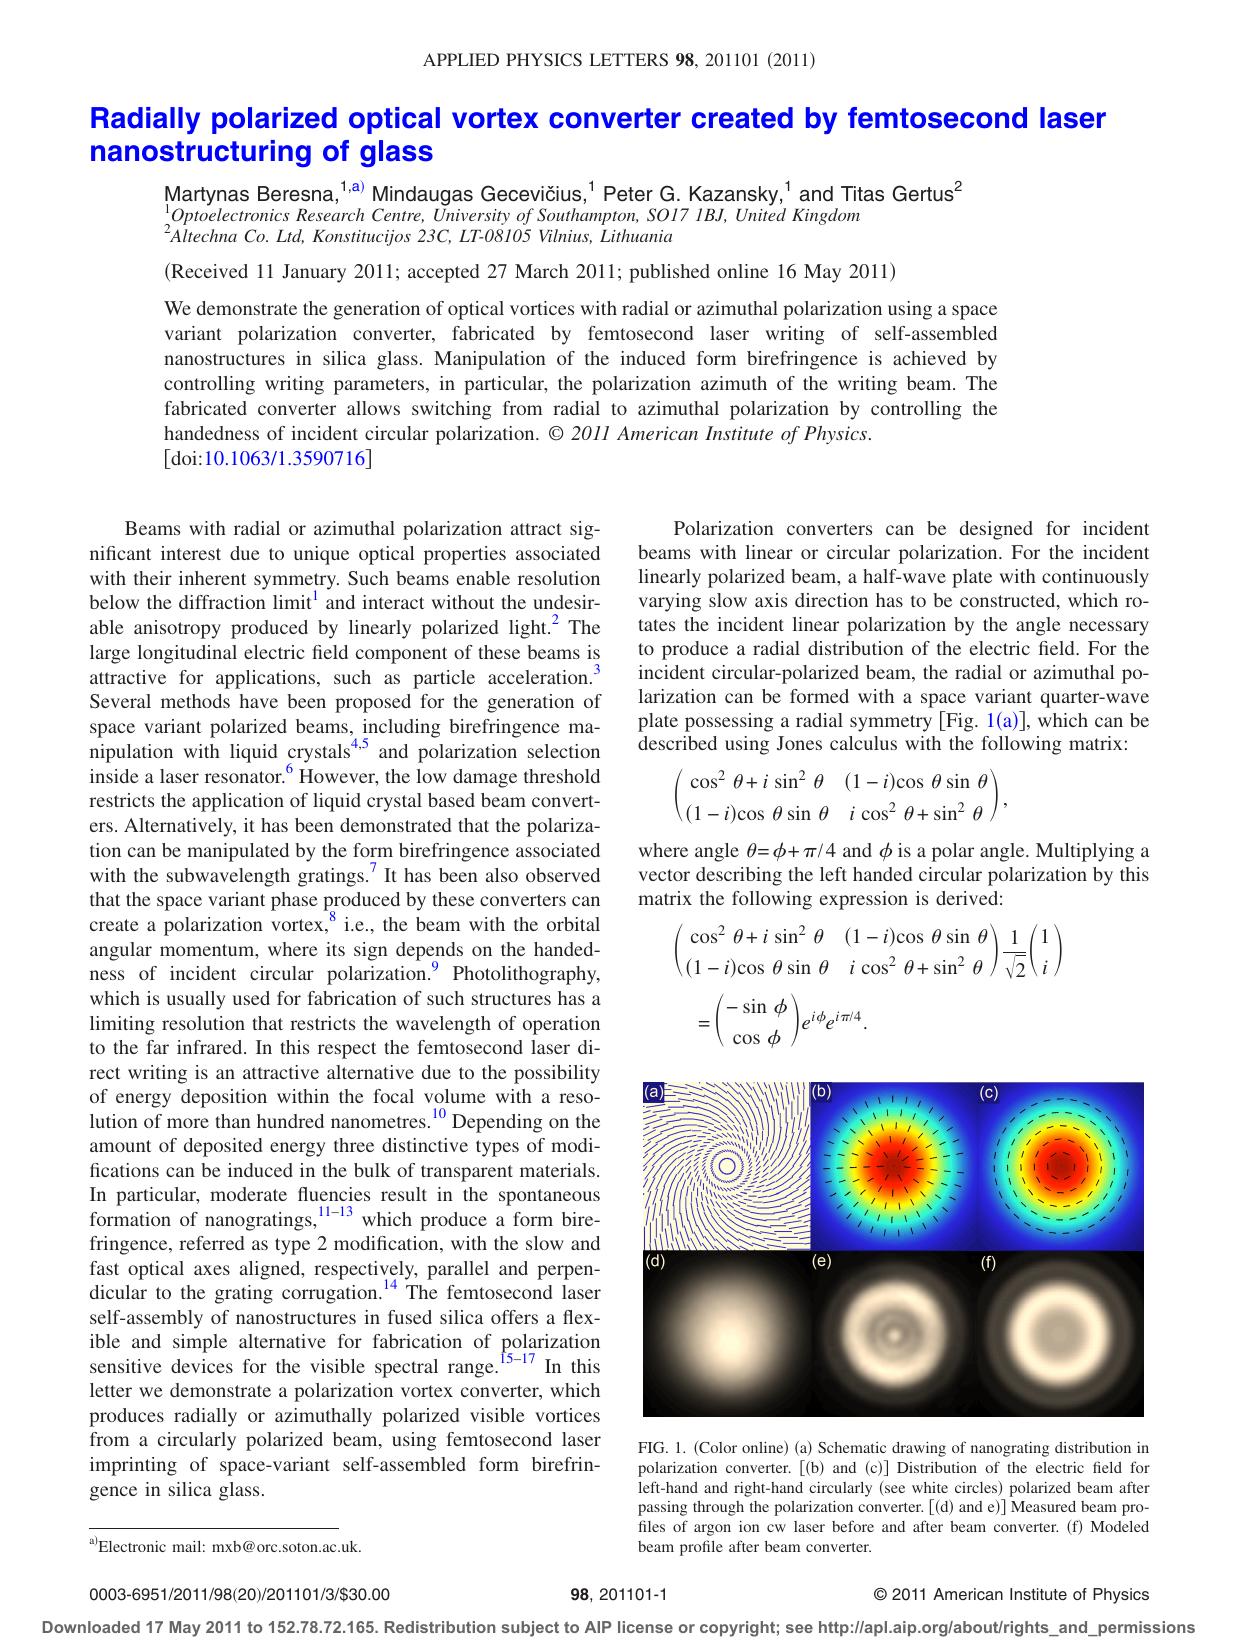 Radially polarized optical vortex converter created by